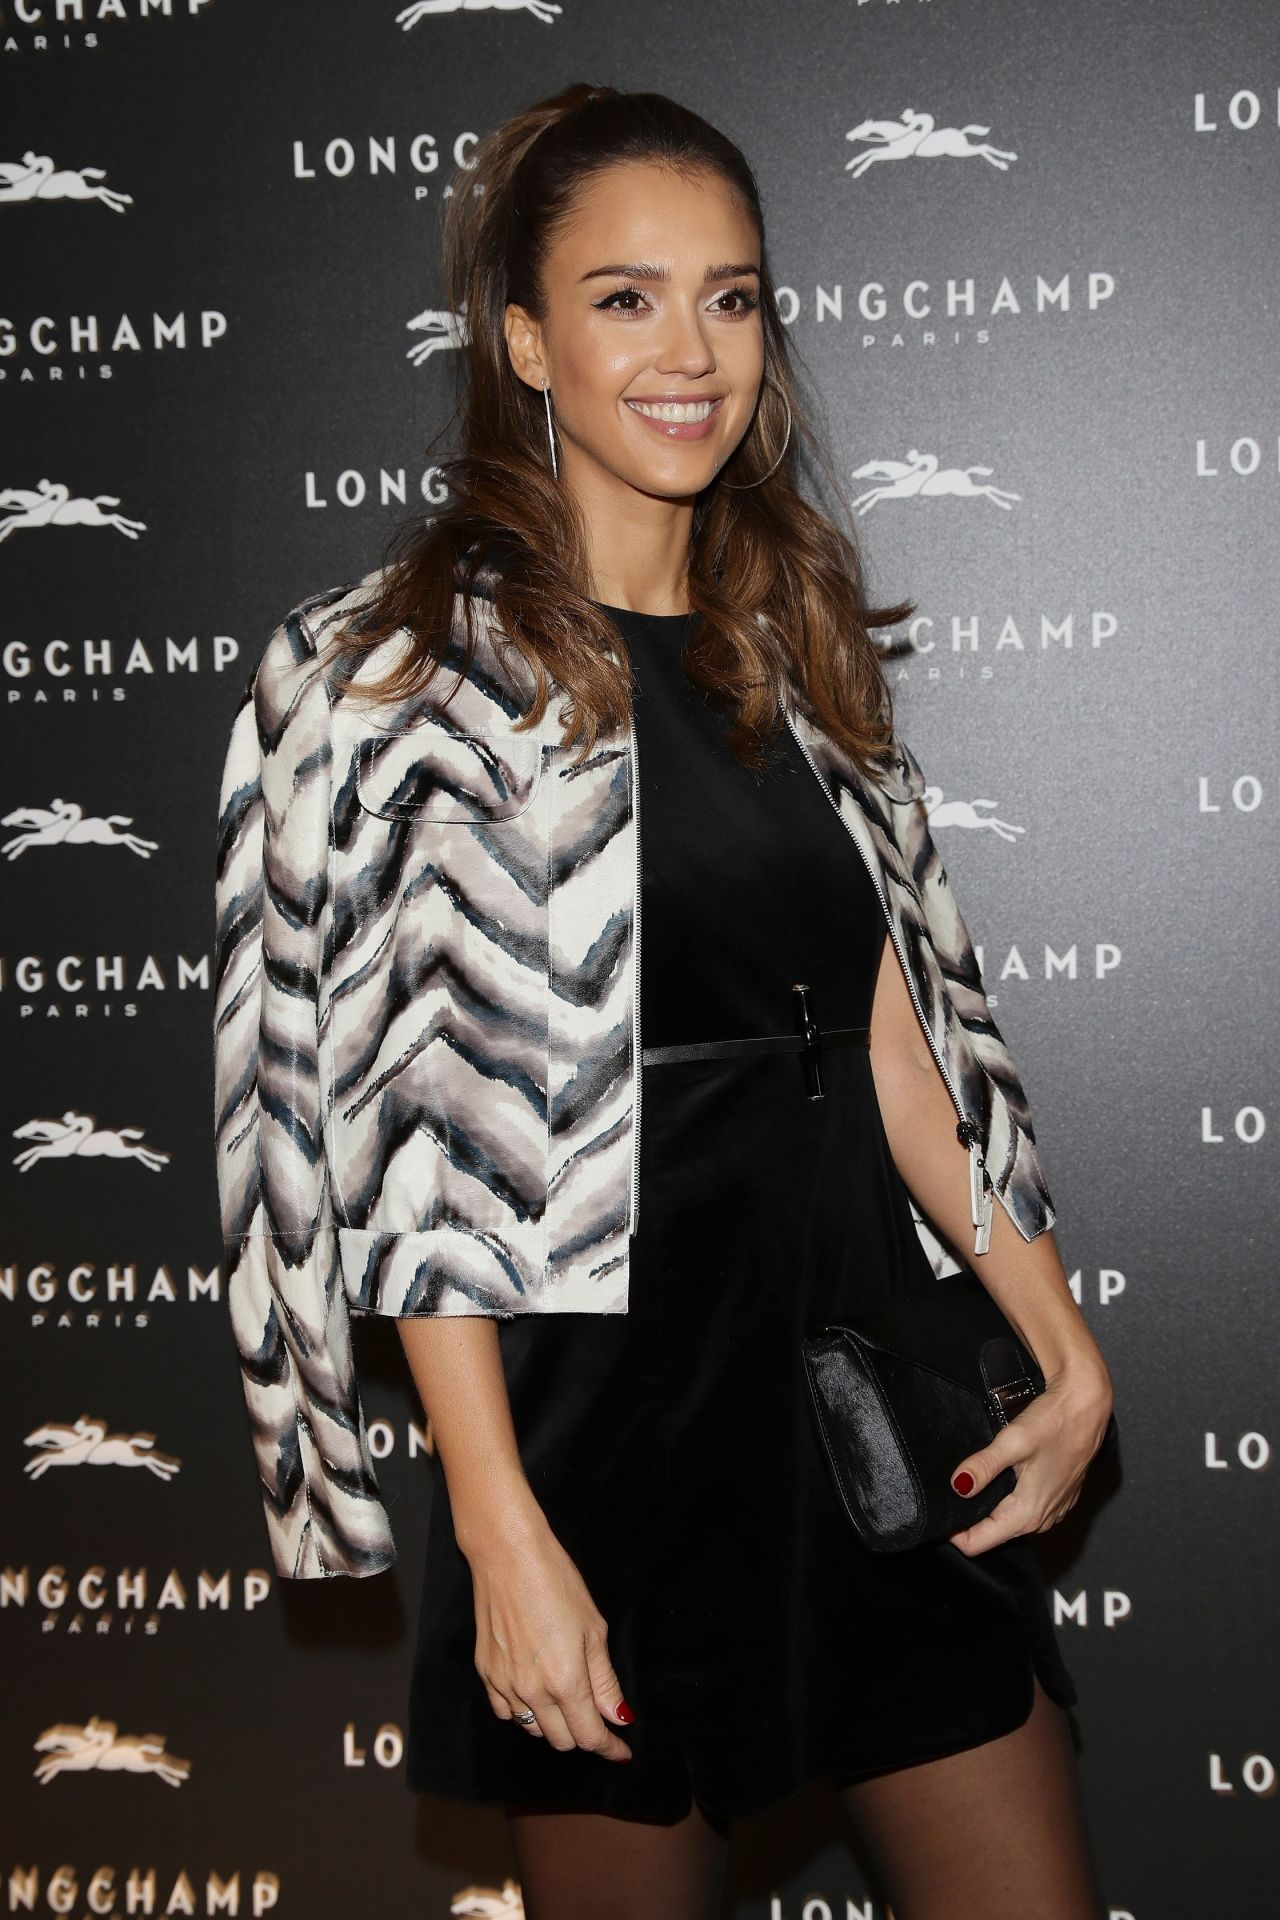 http://celebmafia.com/wp-content/uploads/2016/10/jessica-alba-longchamp-cocktail-at-paris-fashion-week-10-04-2016-3.jpg